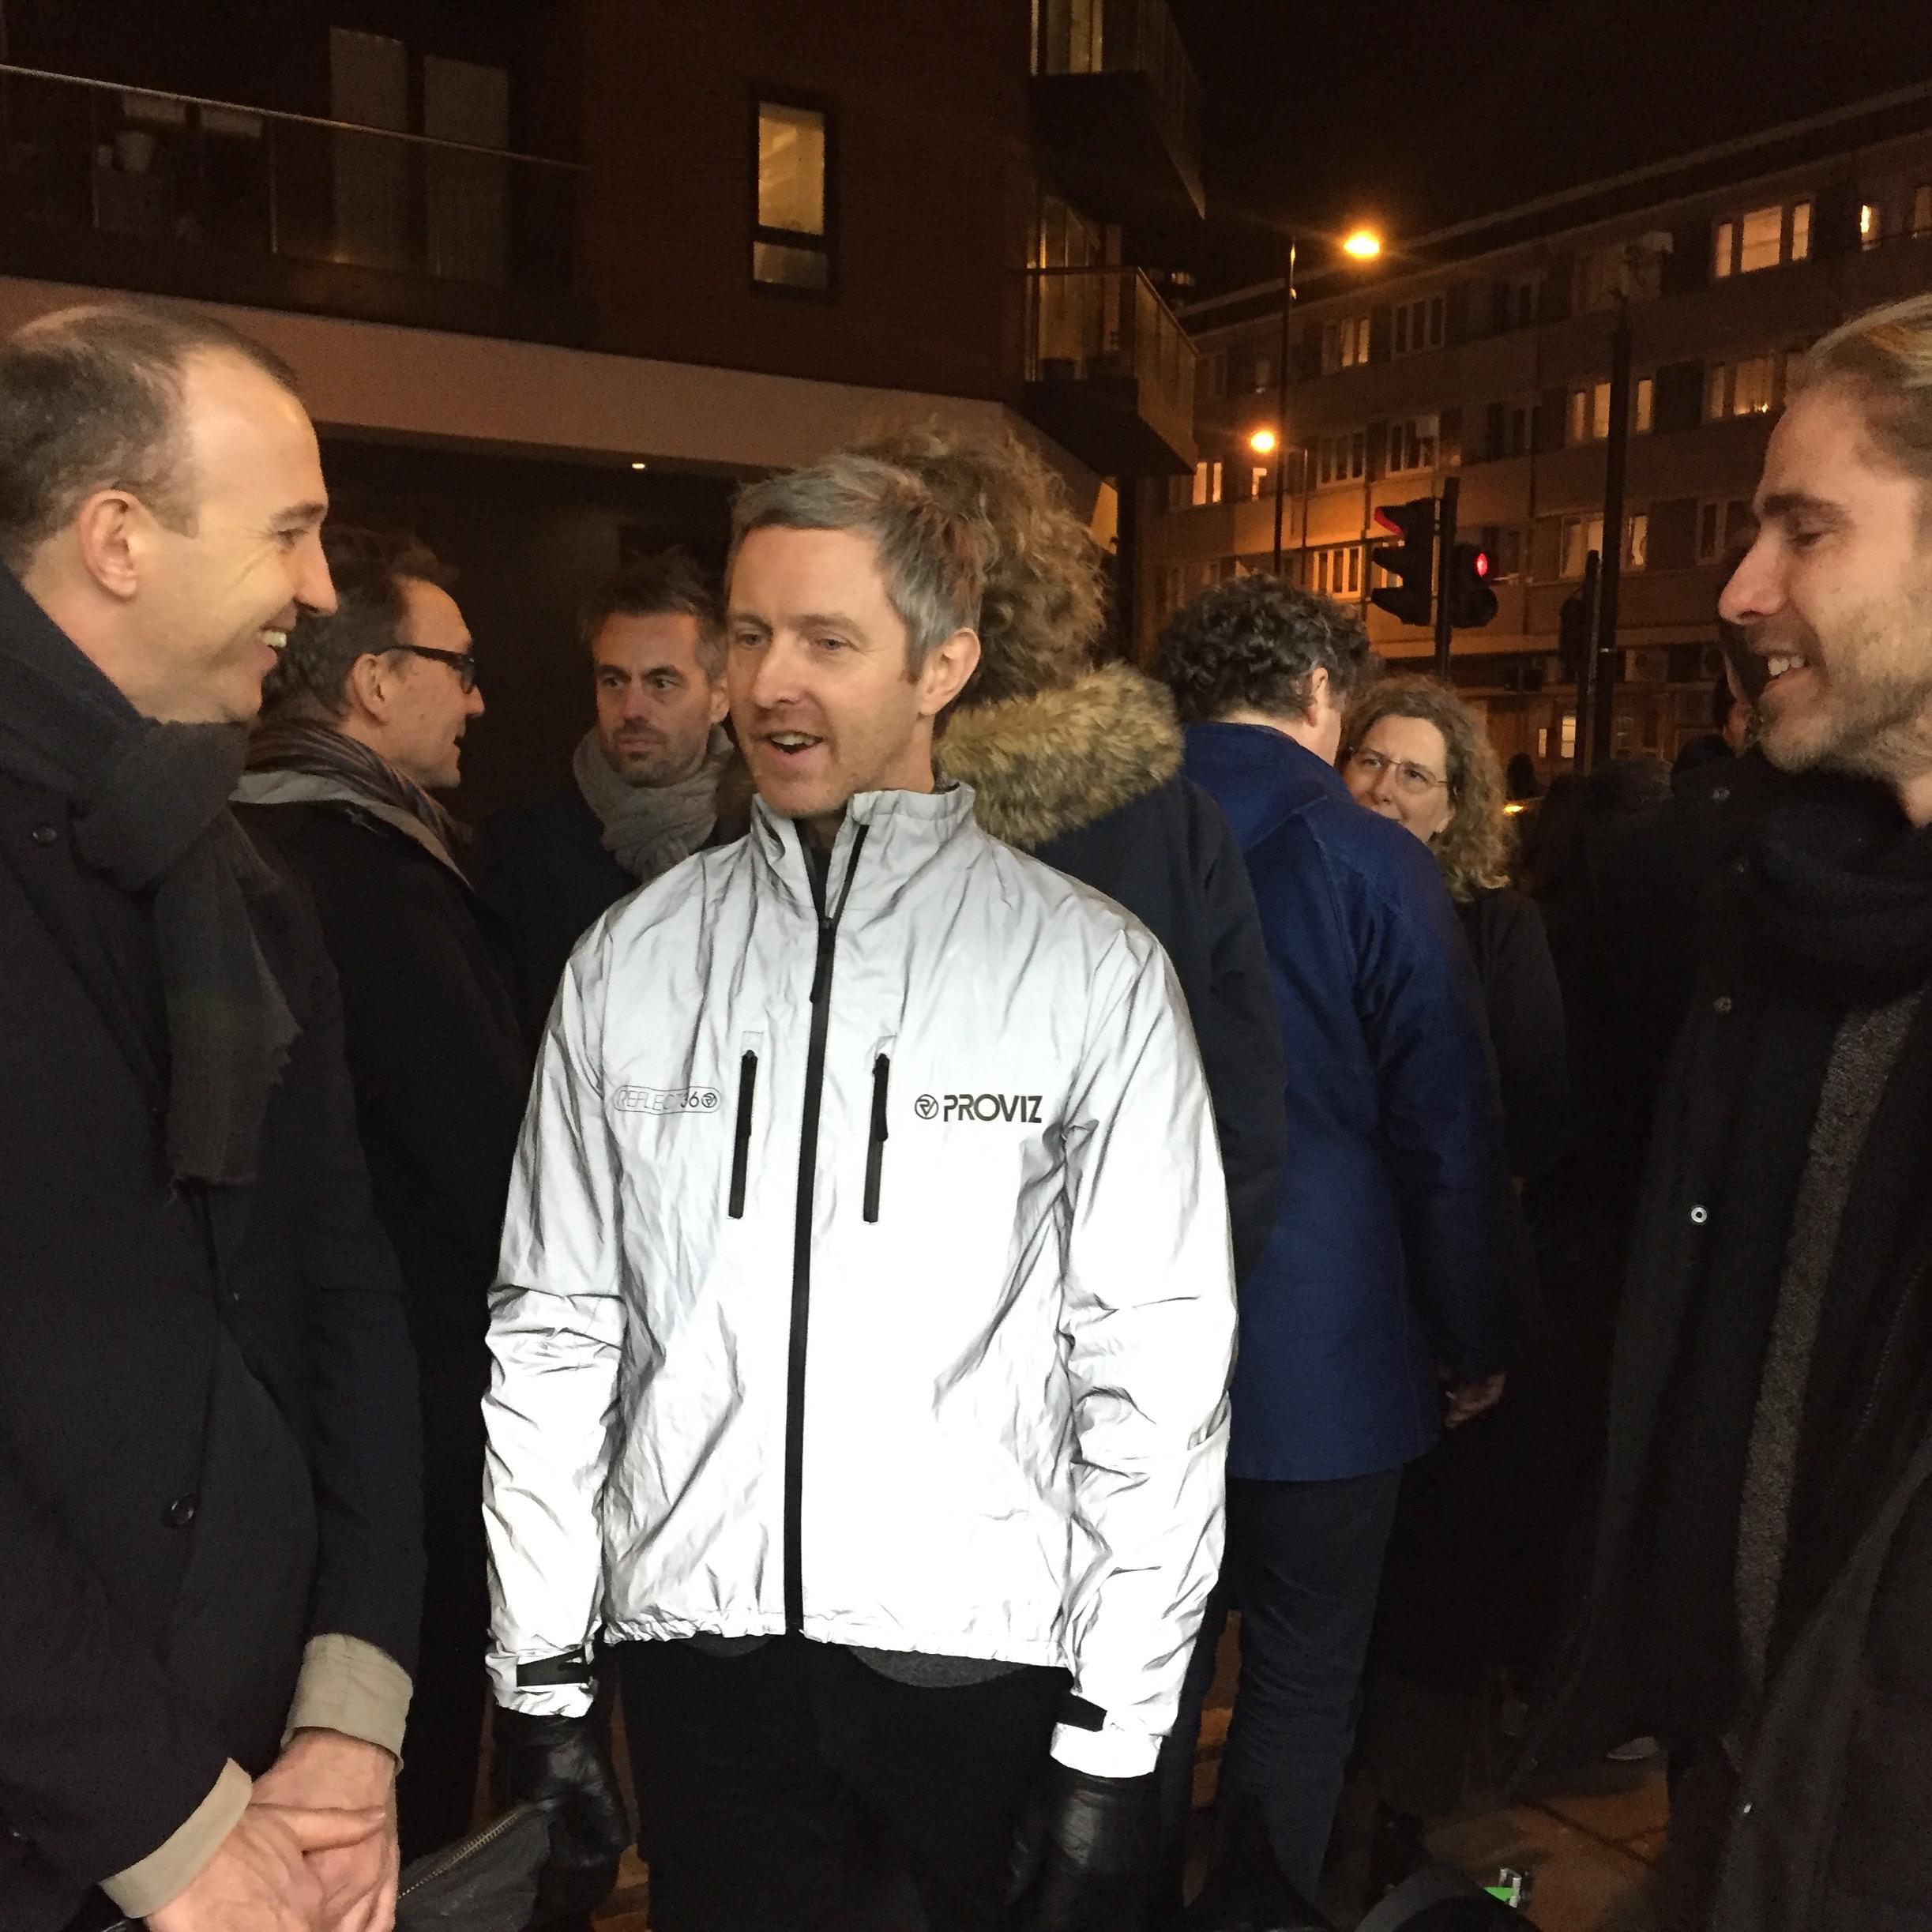 Thomas Weaver, Daniel Rosbottom, Oliver Wainwright